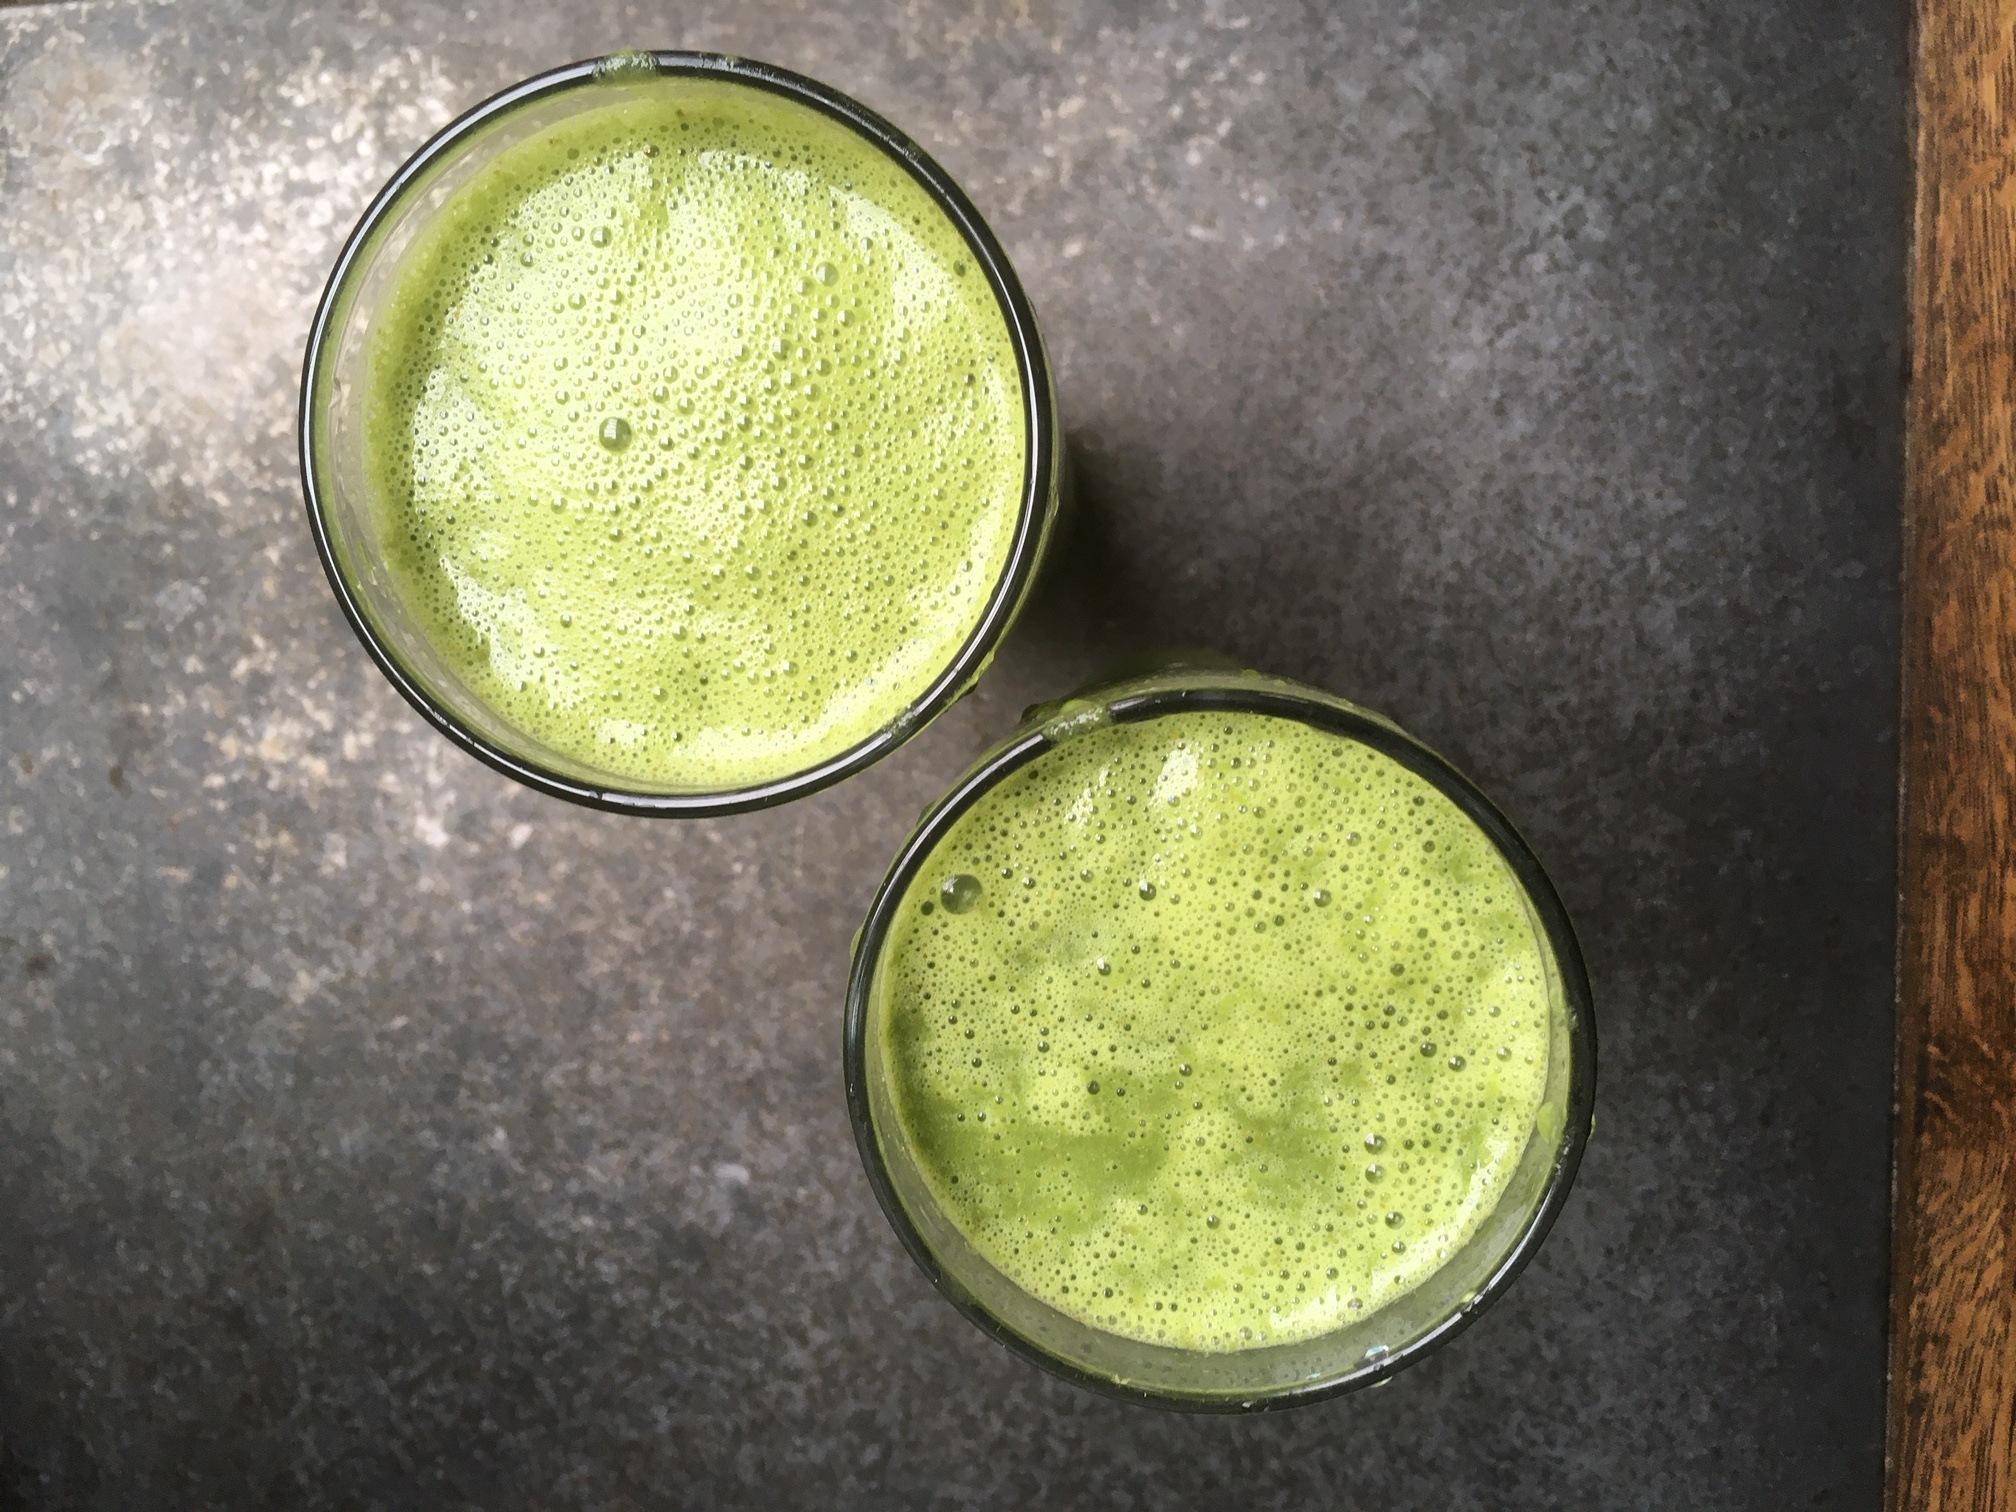 Vitamix green smoothie